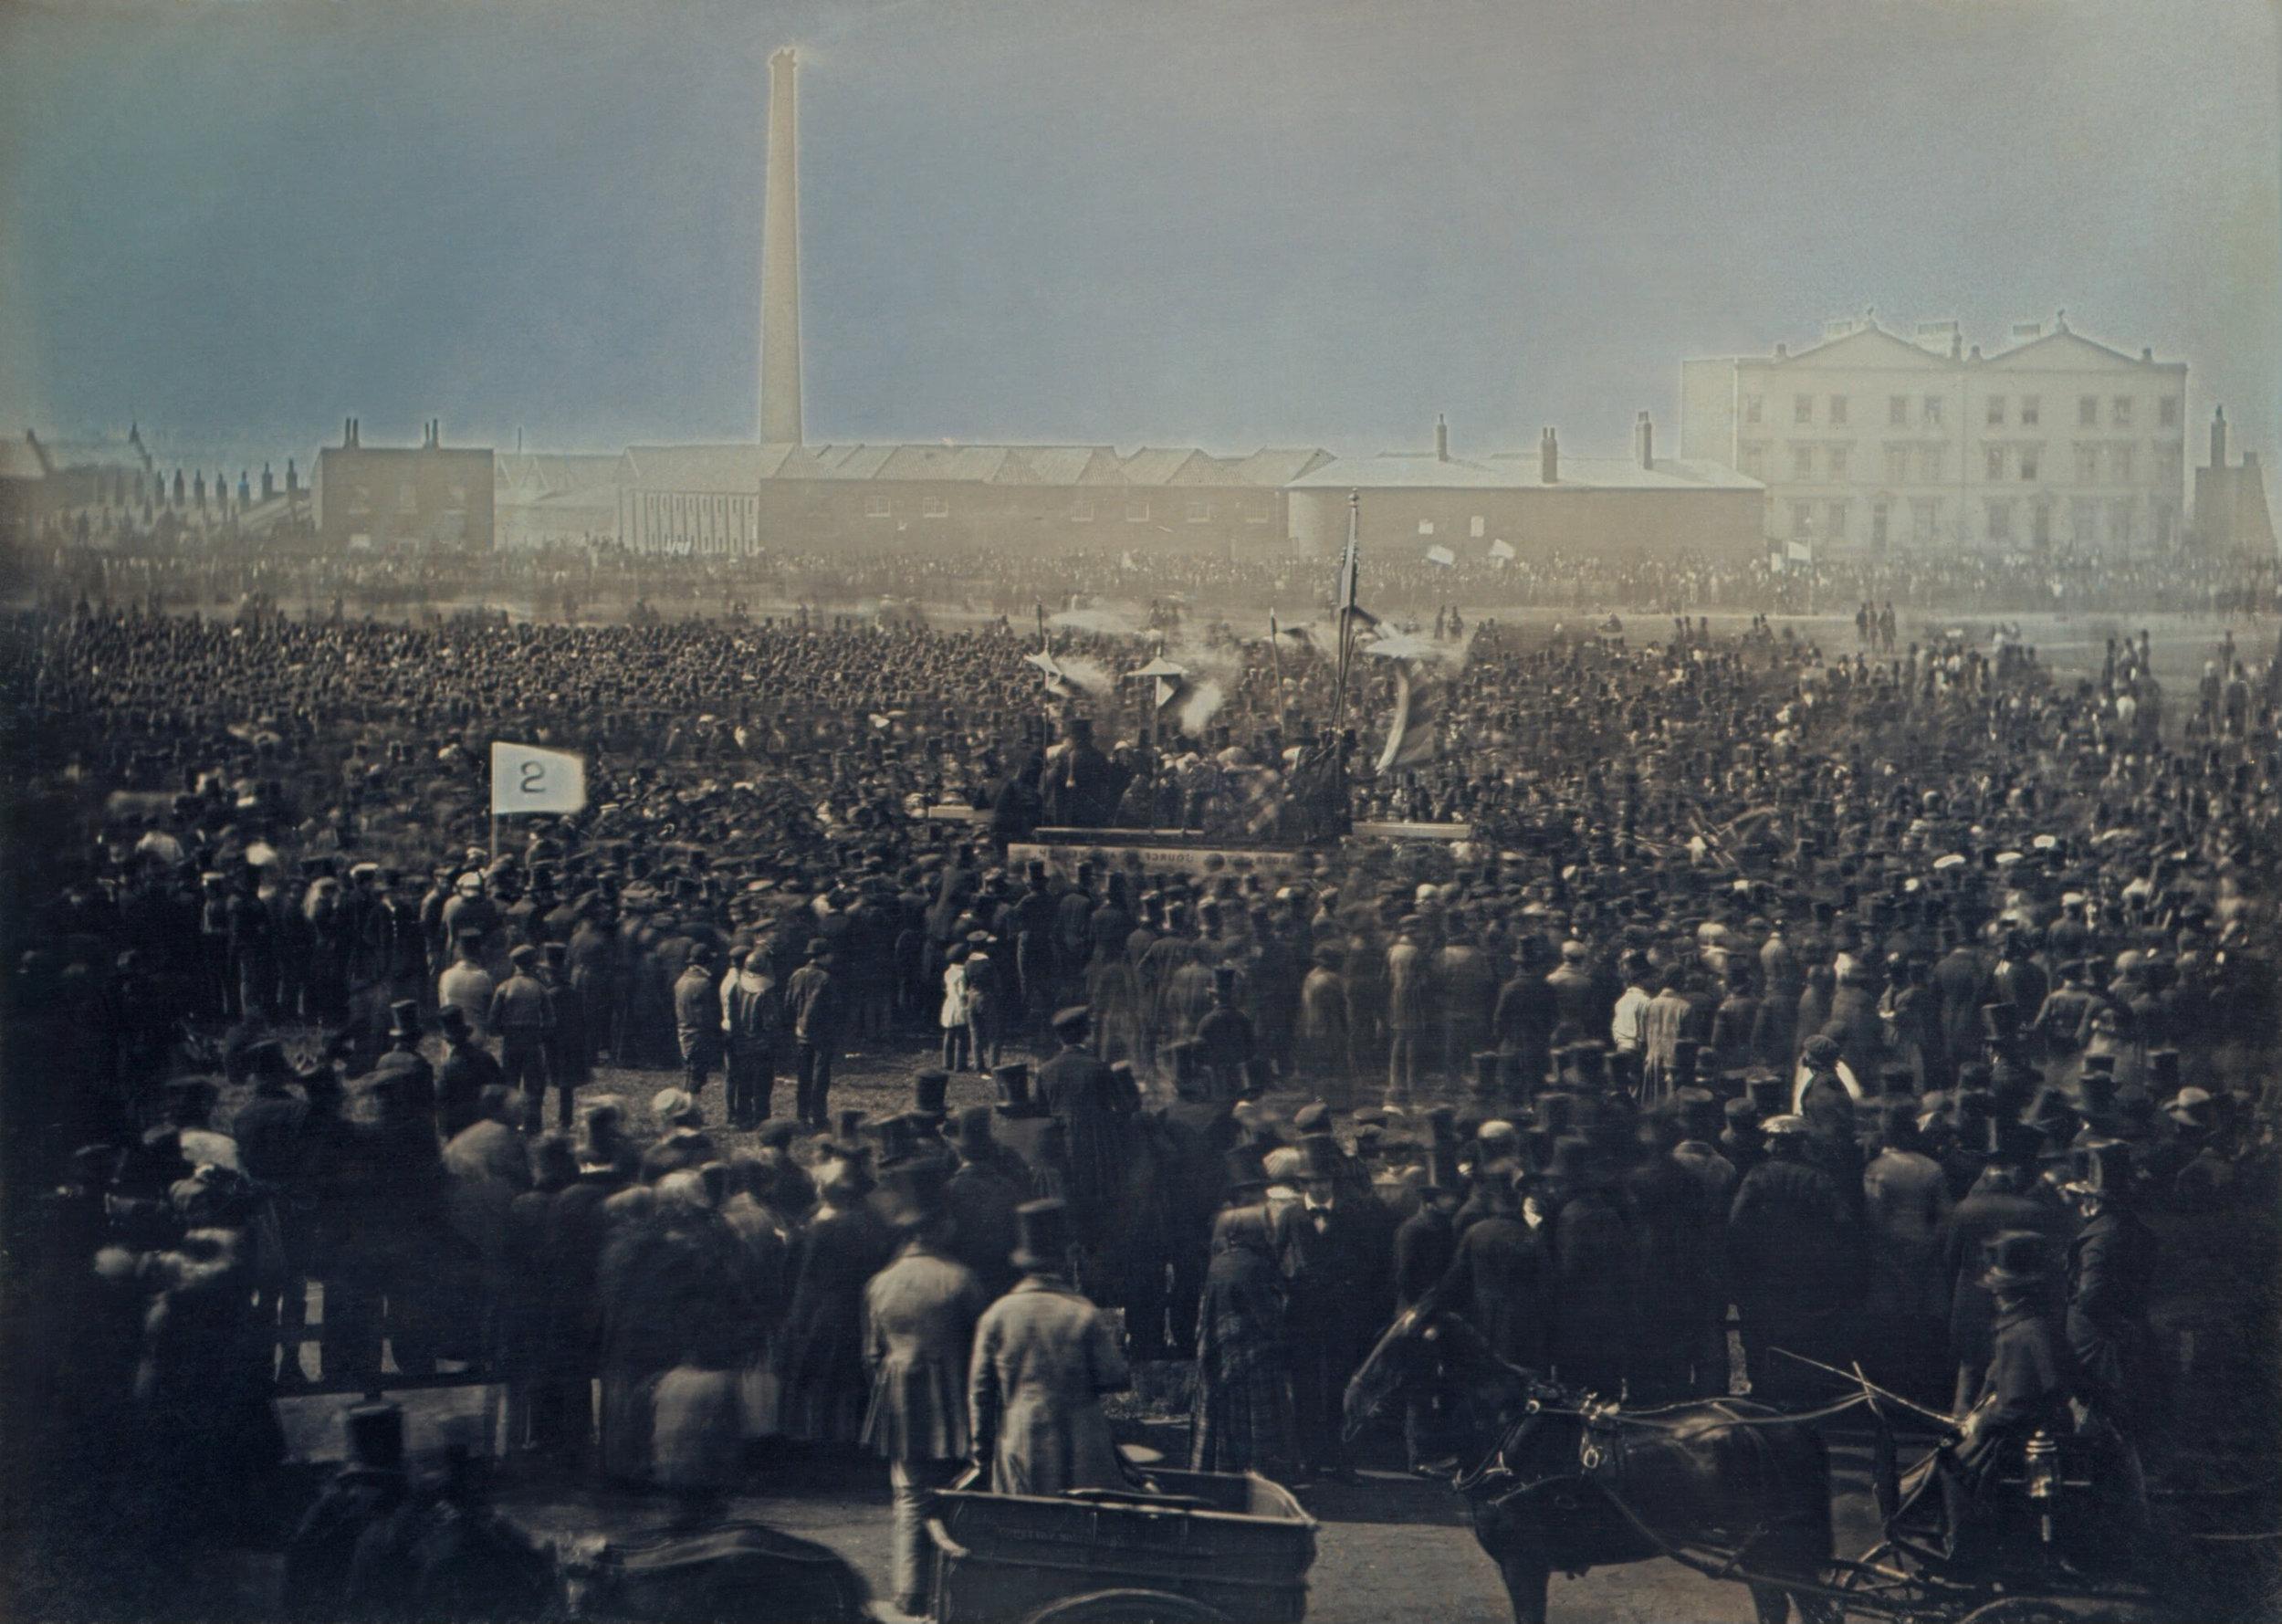 The Great Chartist Meeting on Kennington Common 1848. Photo taken by William Kilburn.